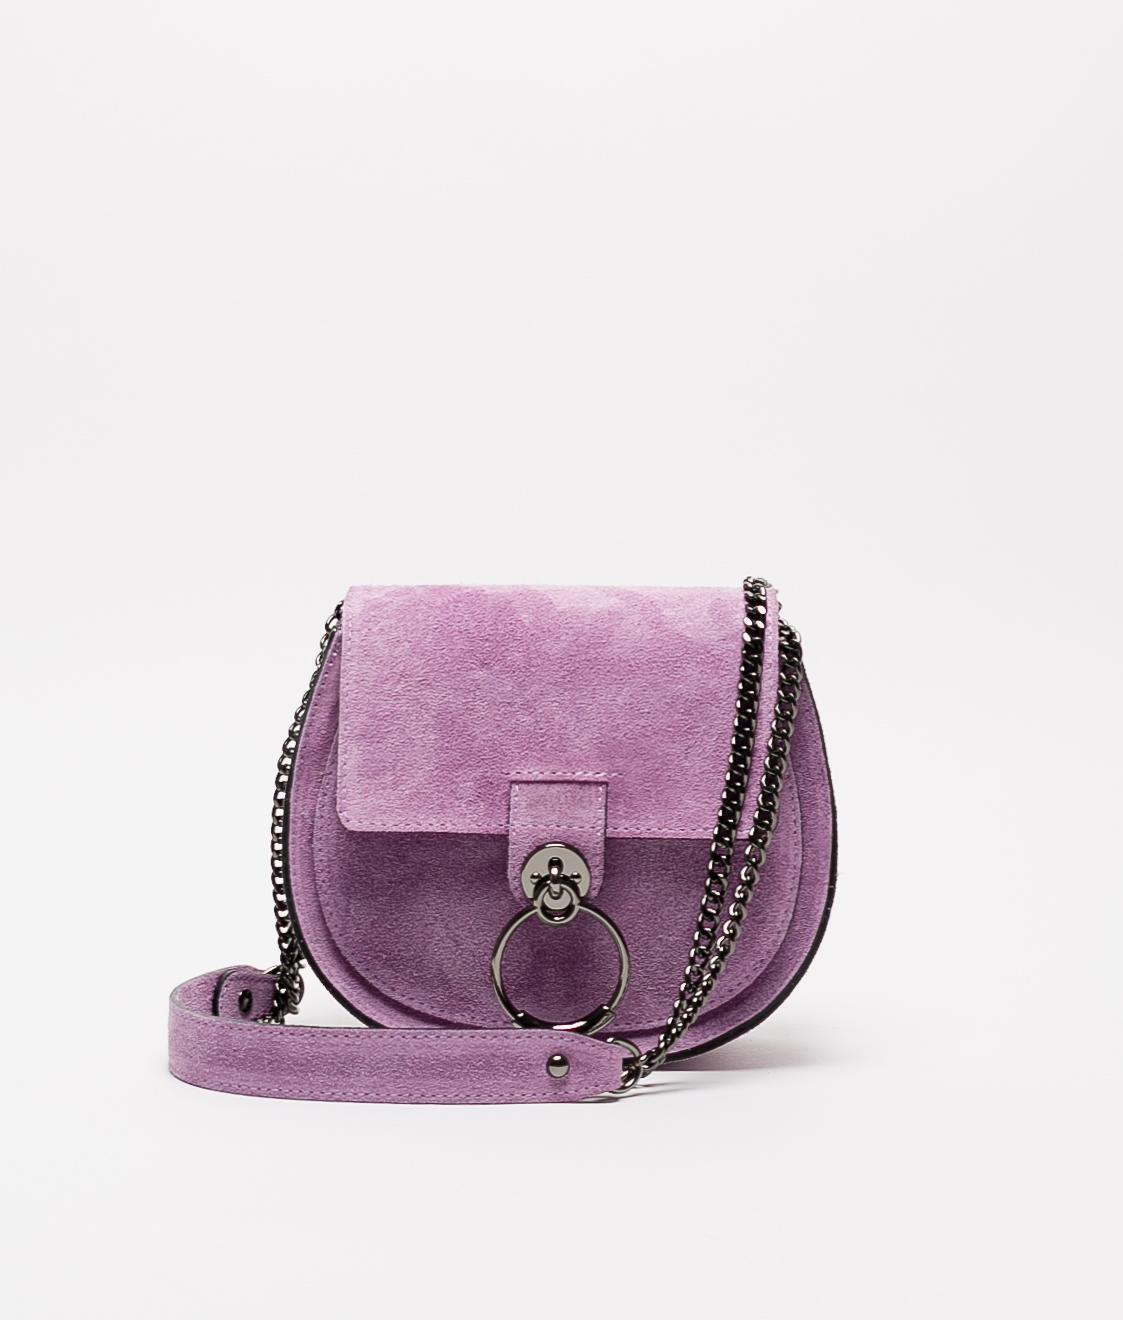 Bandolera de piel Adele - purple